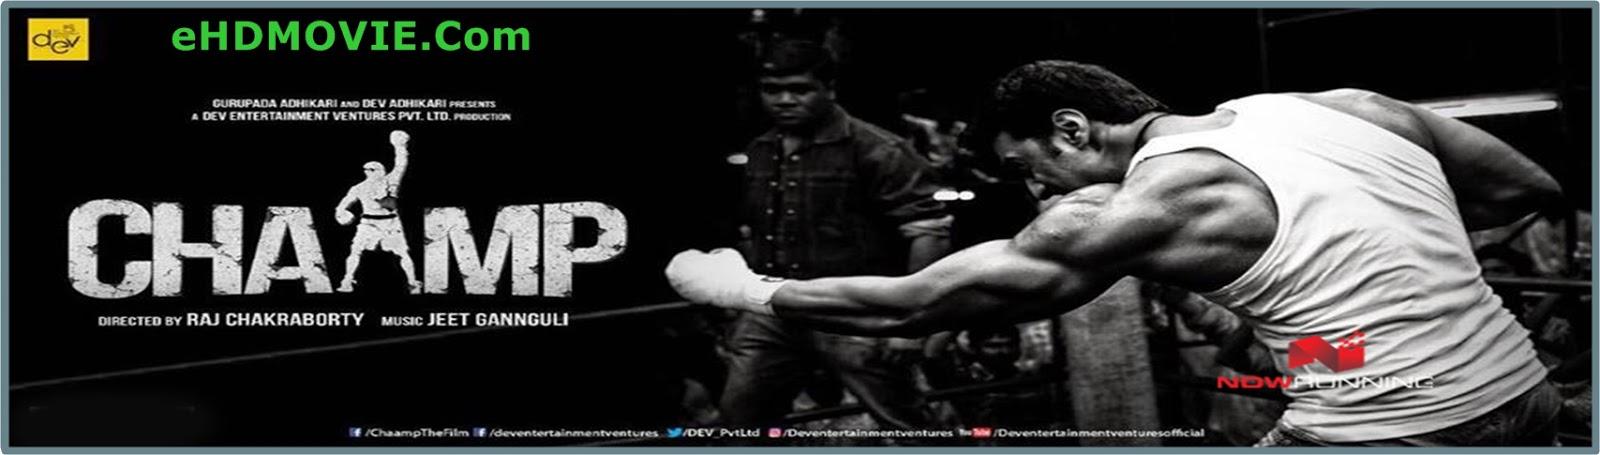 Chaamp 2017 Bengali Full Movie Original 480p - 720p ORG WEB-DL 550MB - 1.2GB